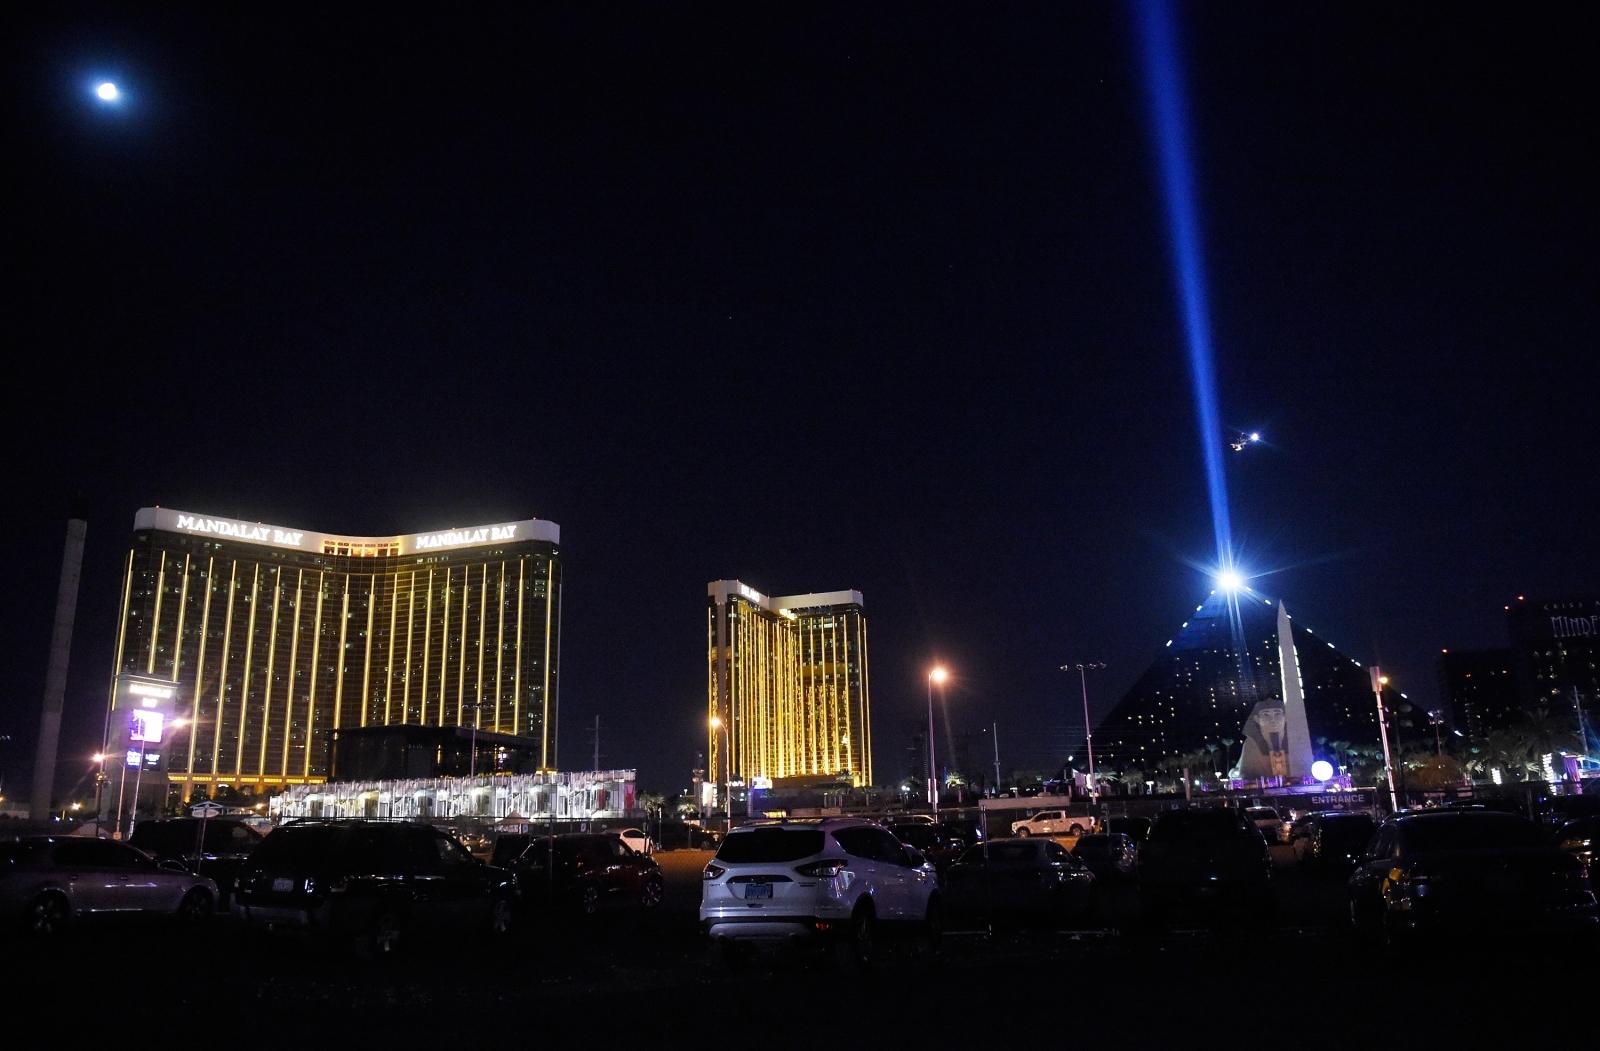 Las Vegas Hotel Shooting